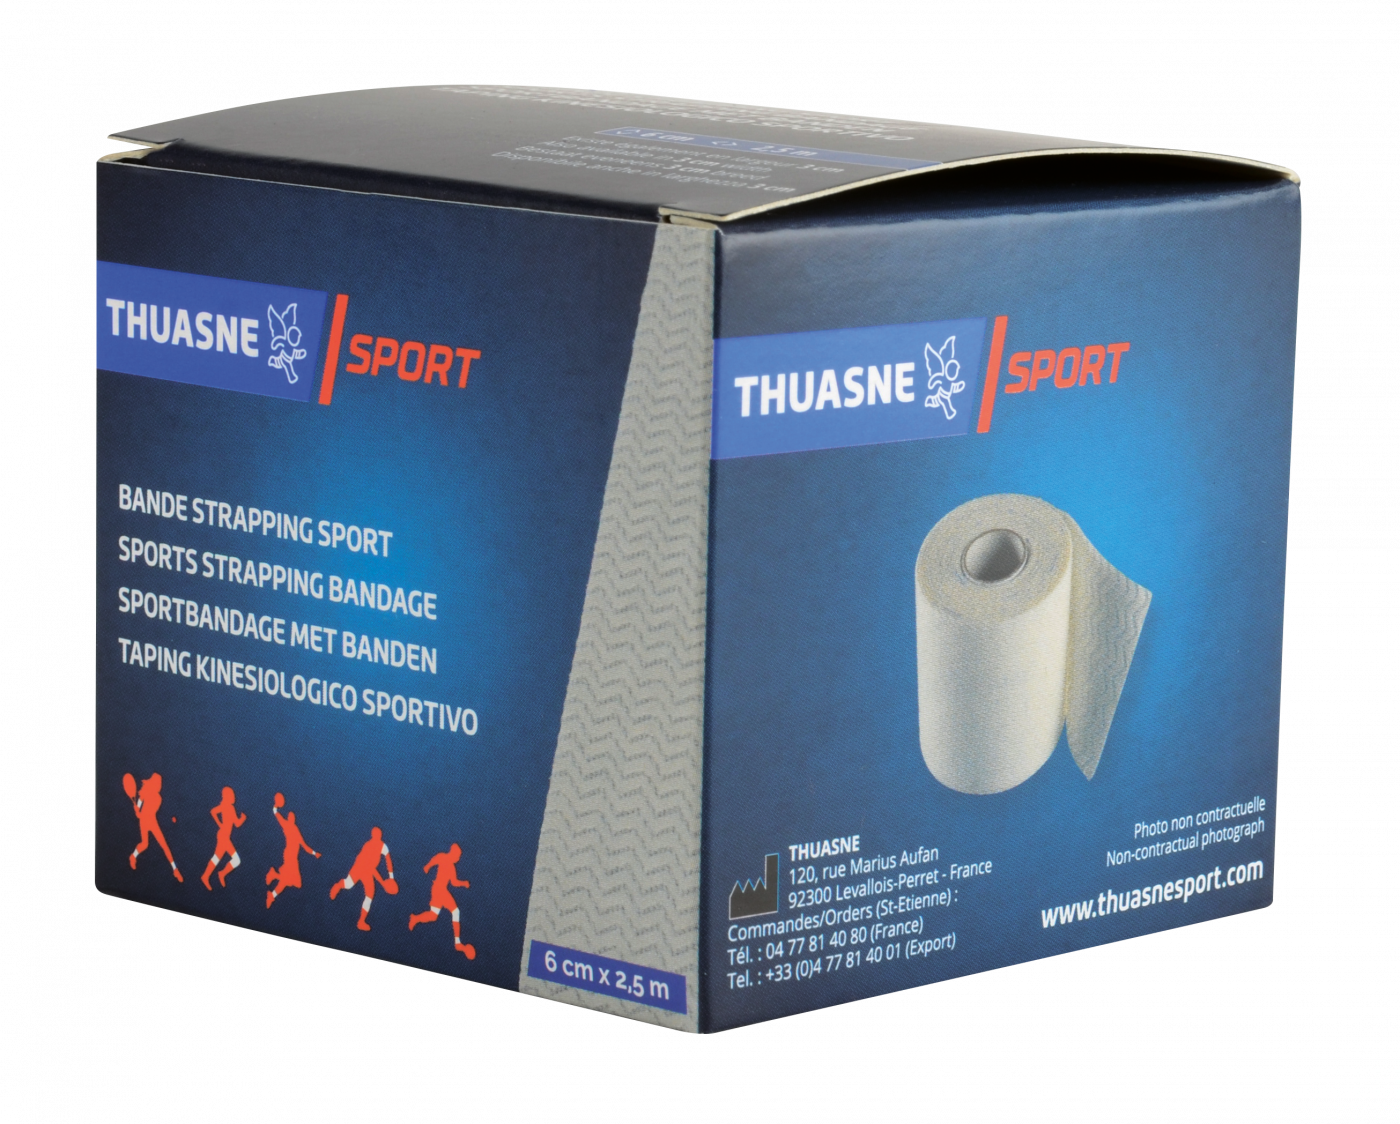 strap_thuasne_sport_running_runapck_3